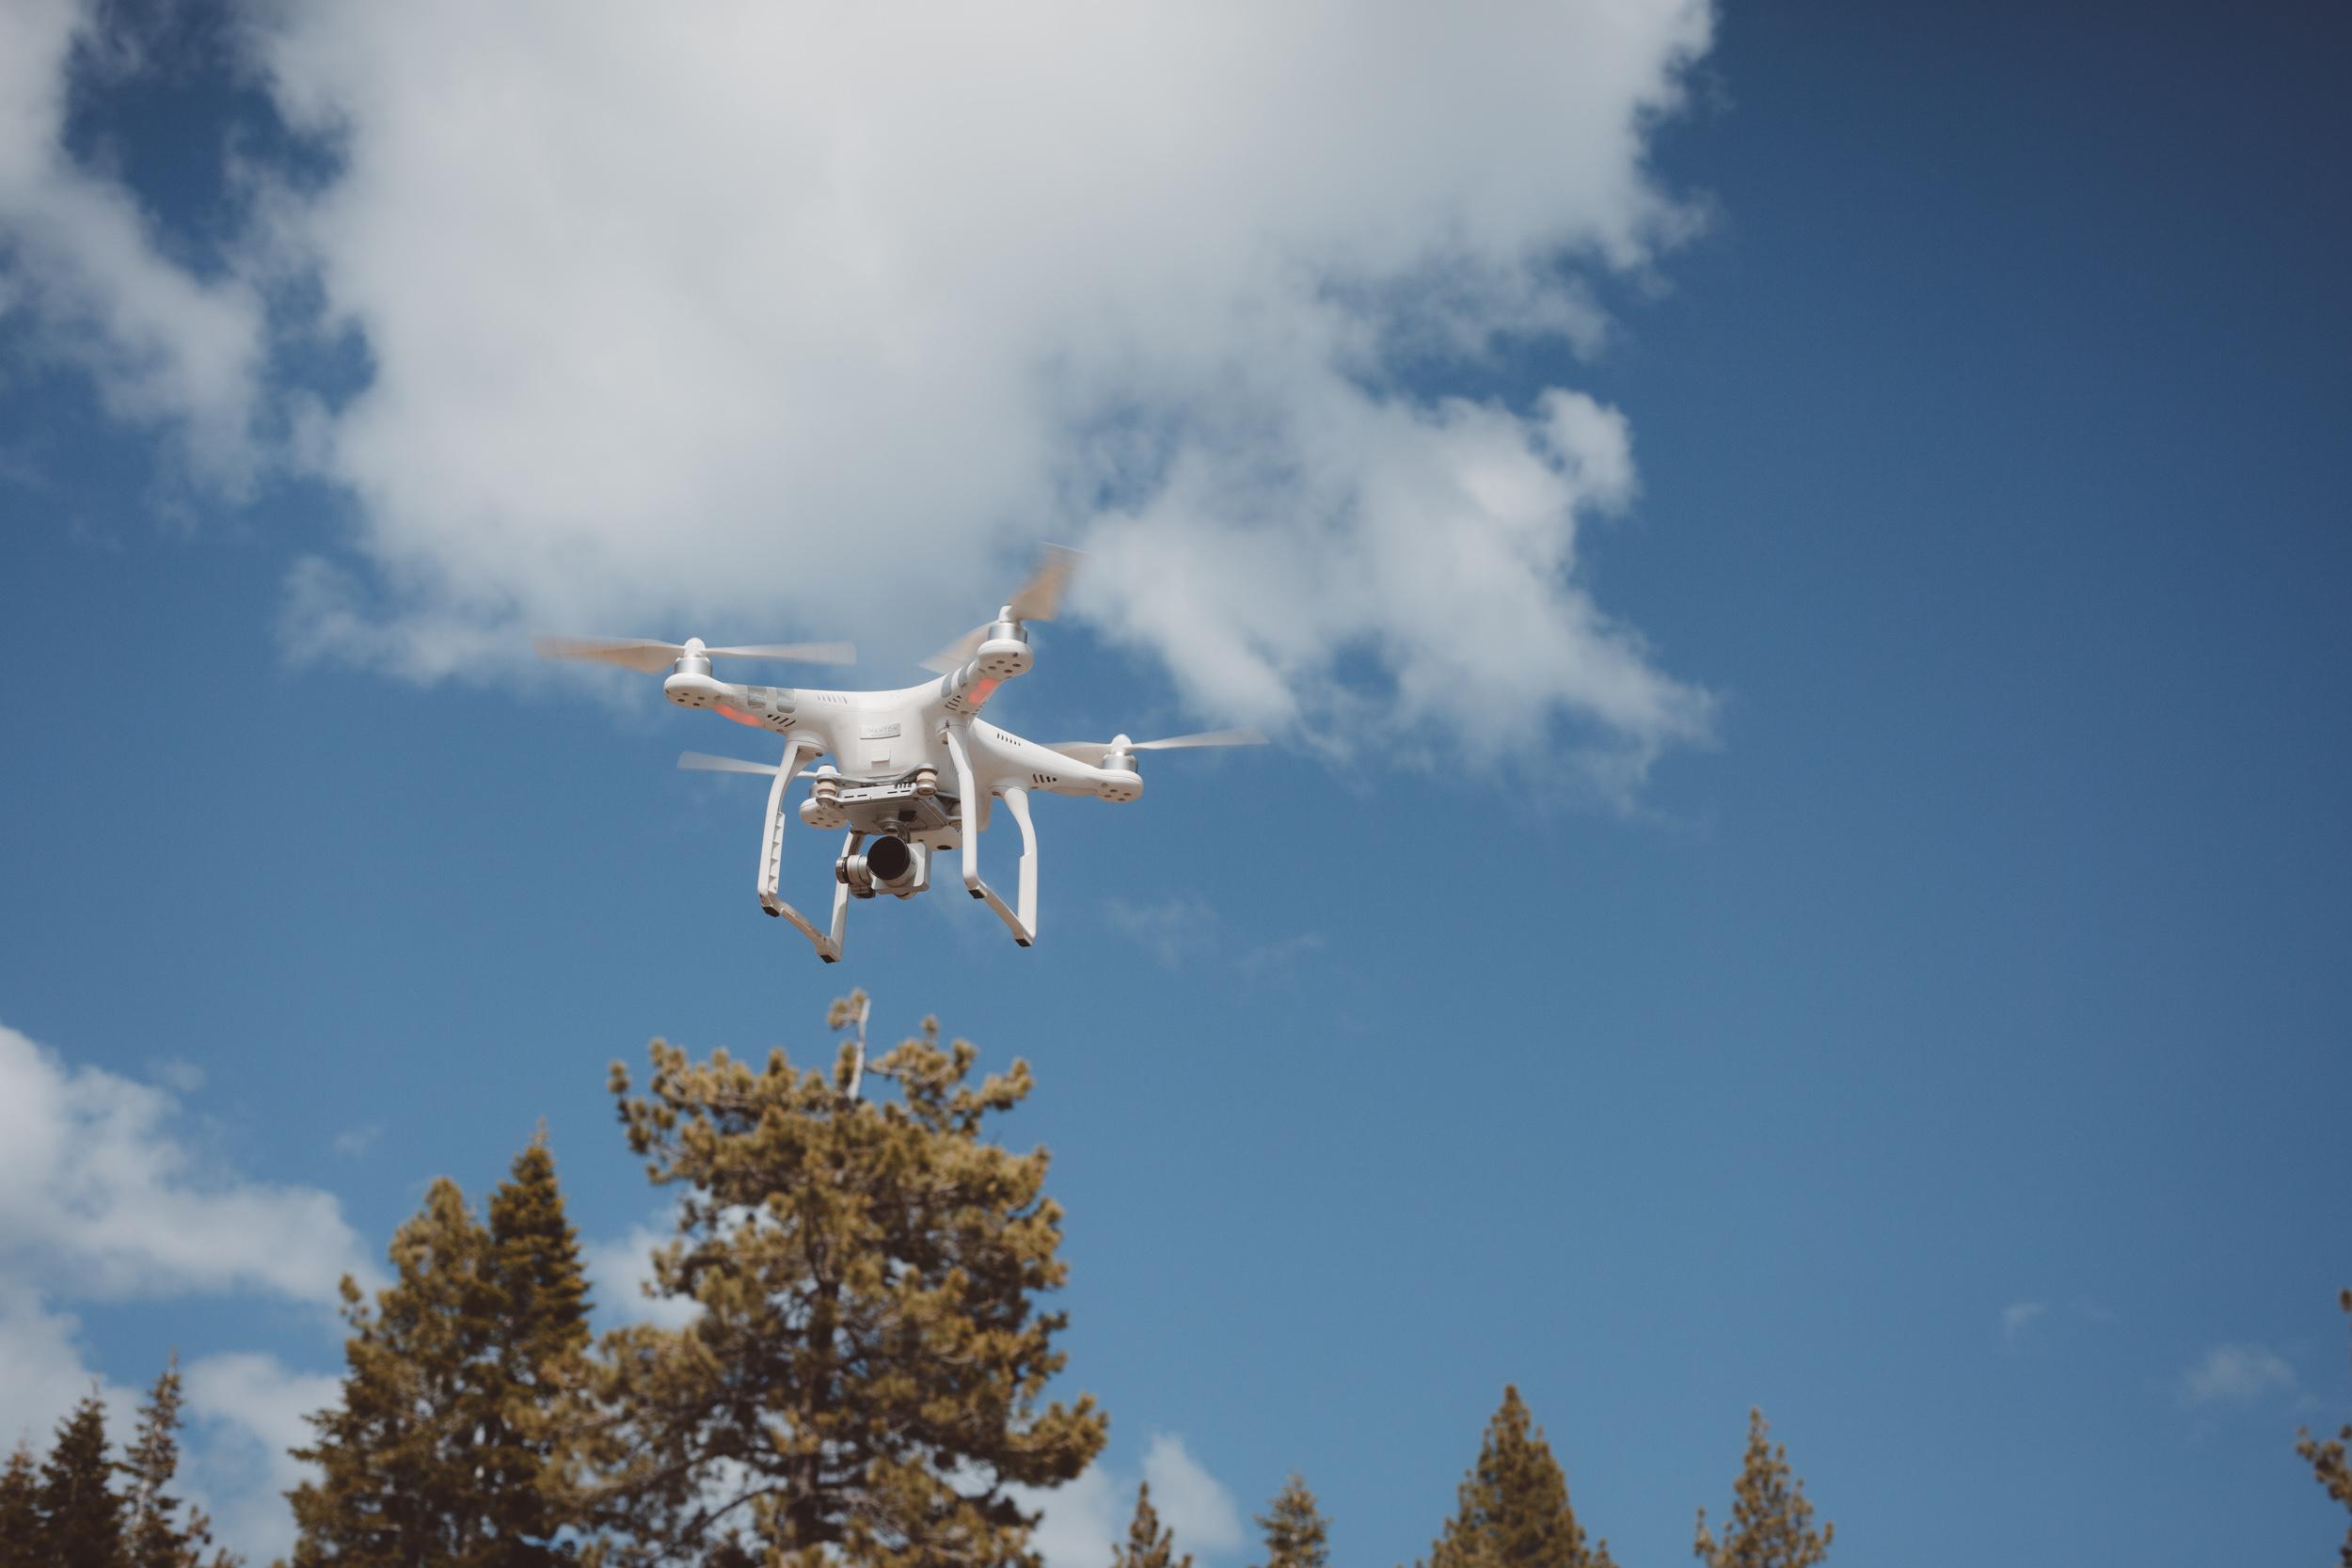 west-shore-adventure-meeks-bay-drone-hike-and-shoot-1.jpg